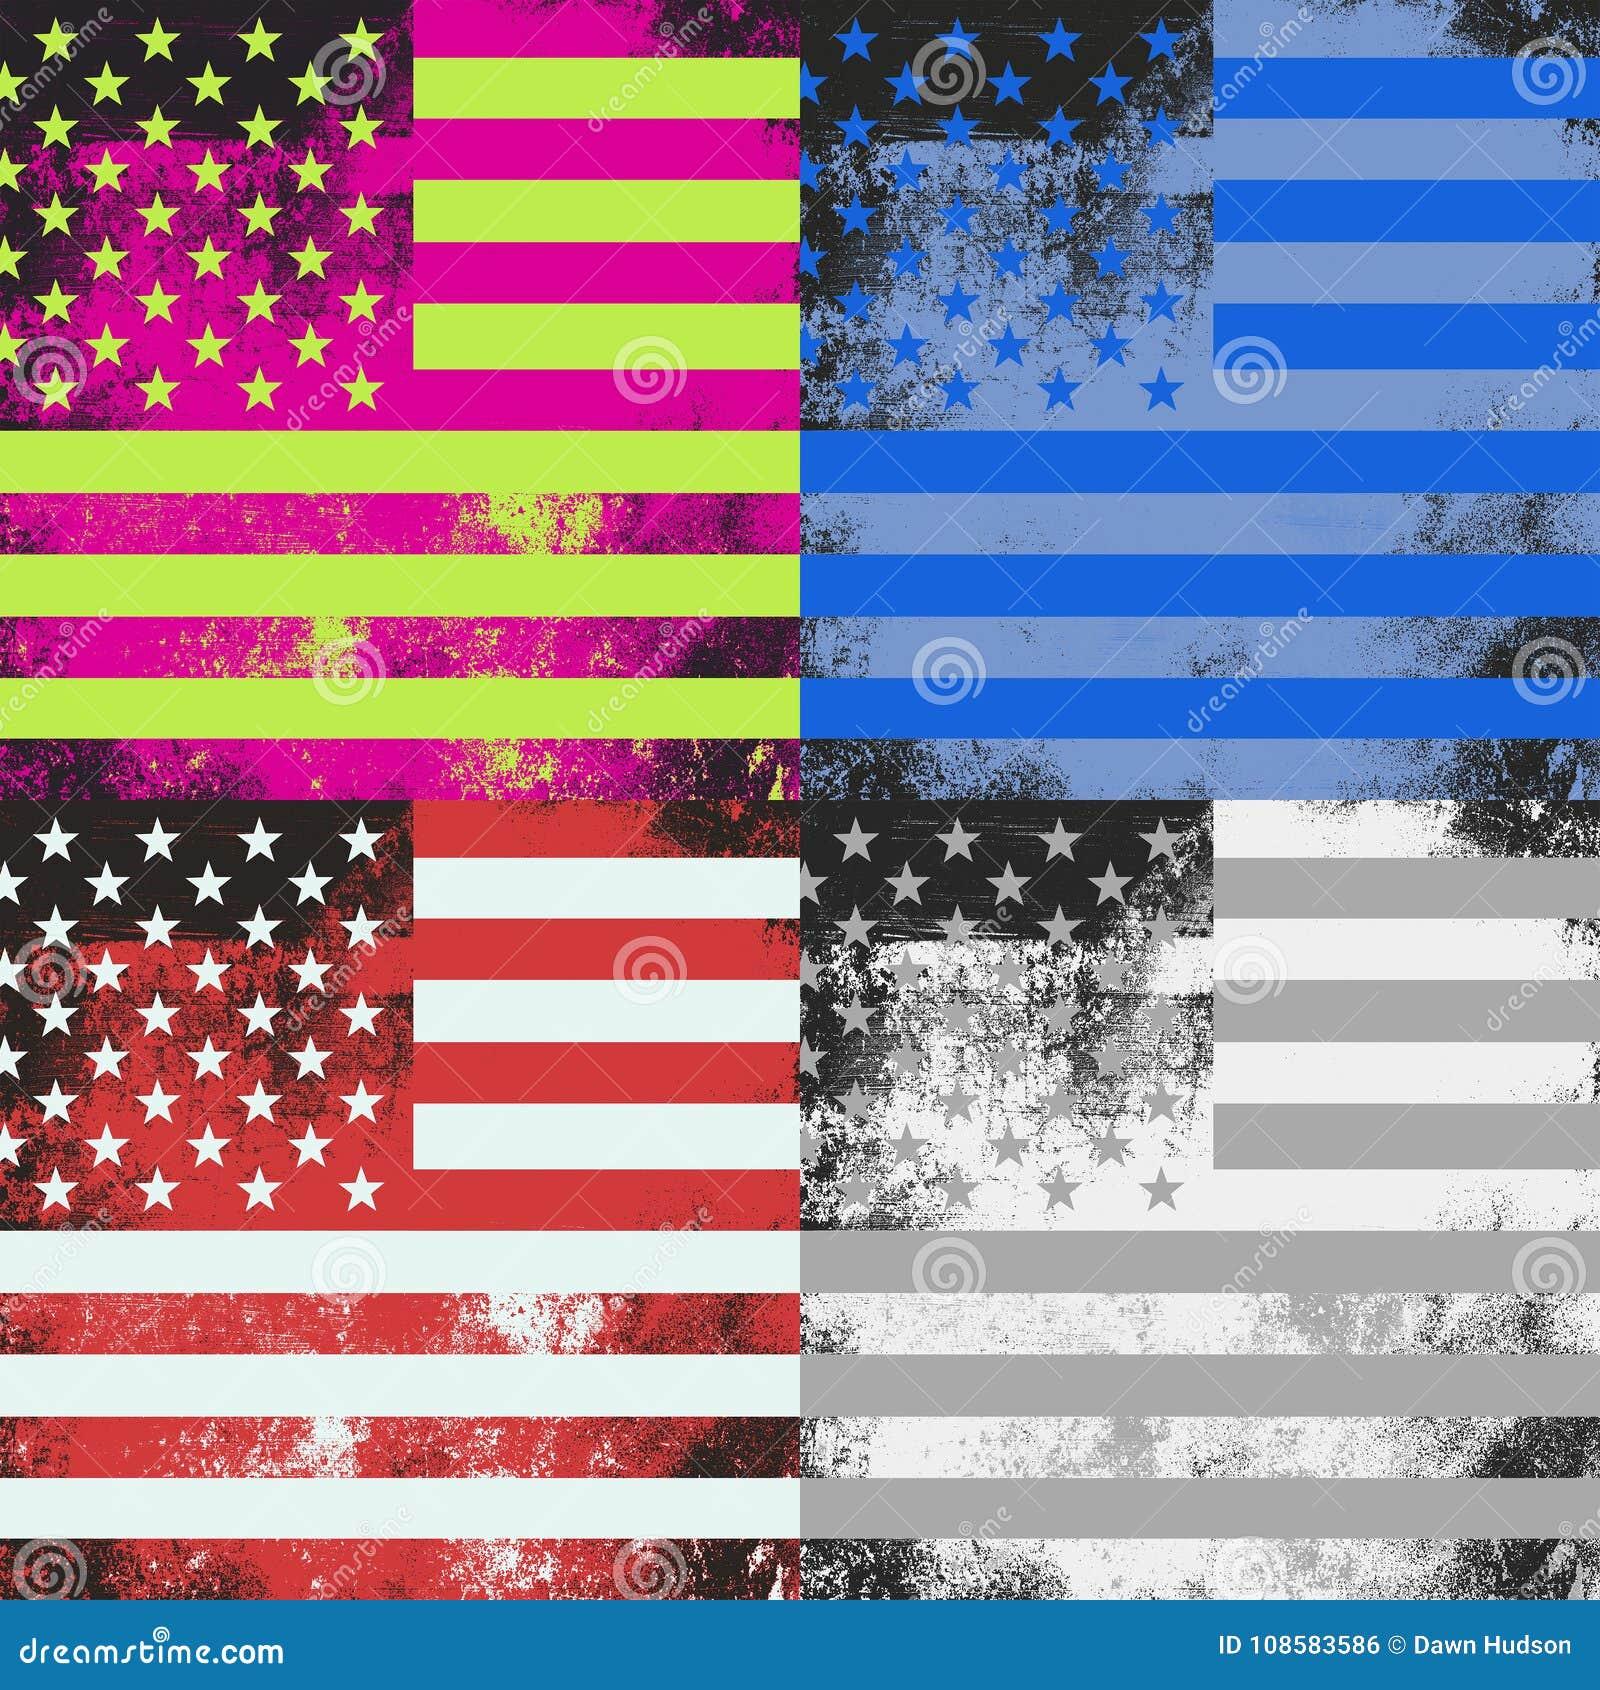 Bruit Art American Flag Design